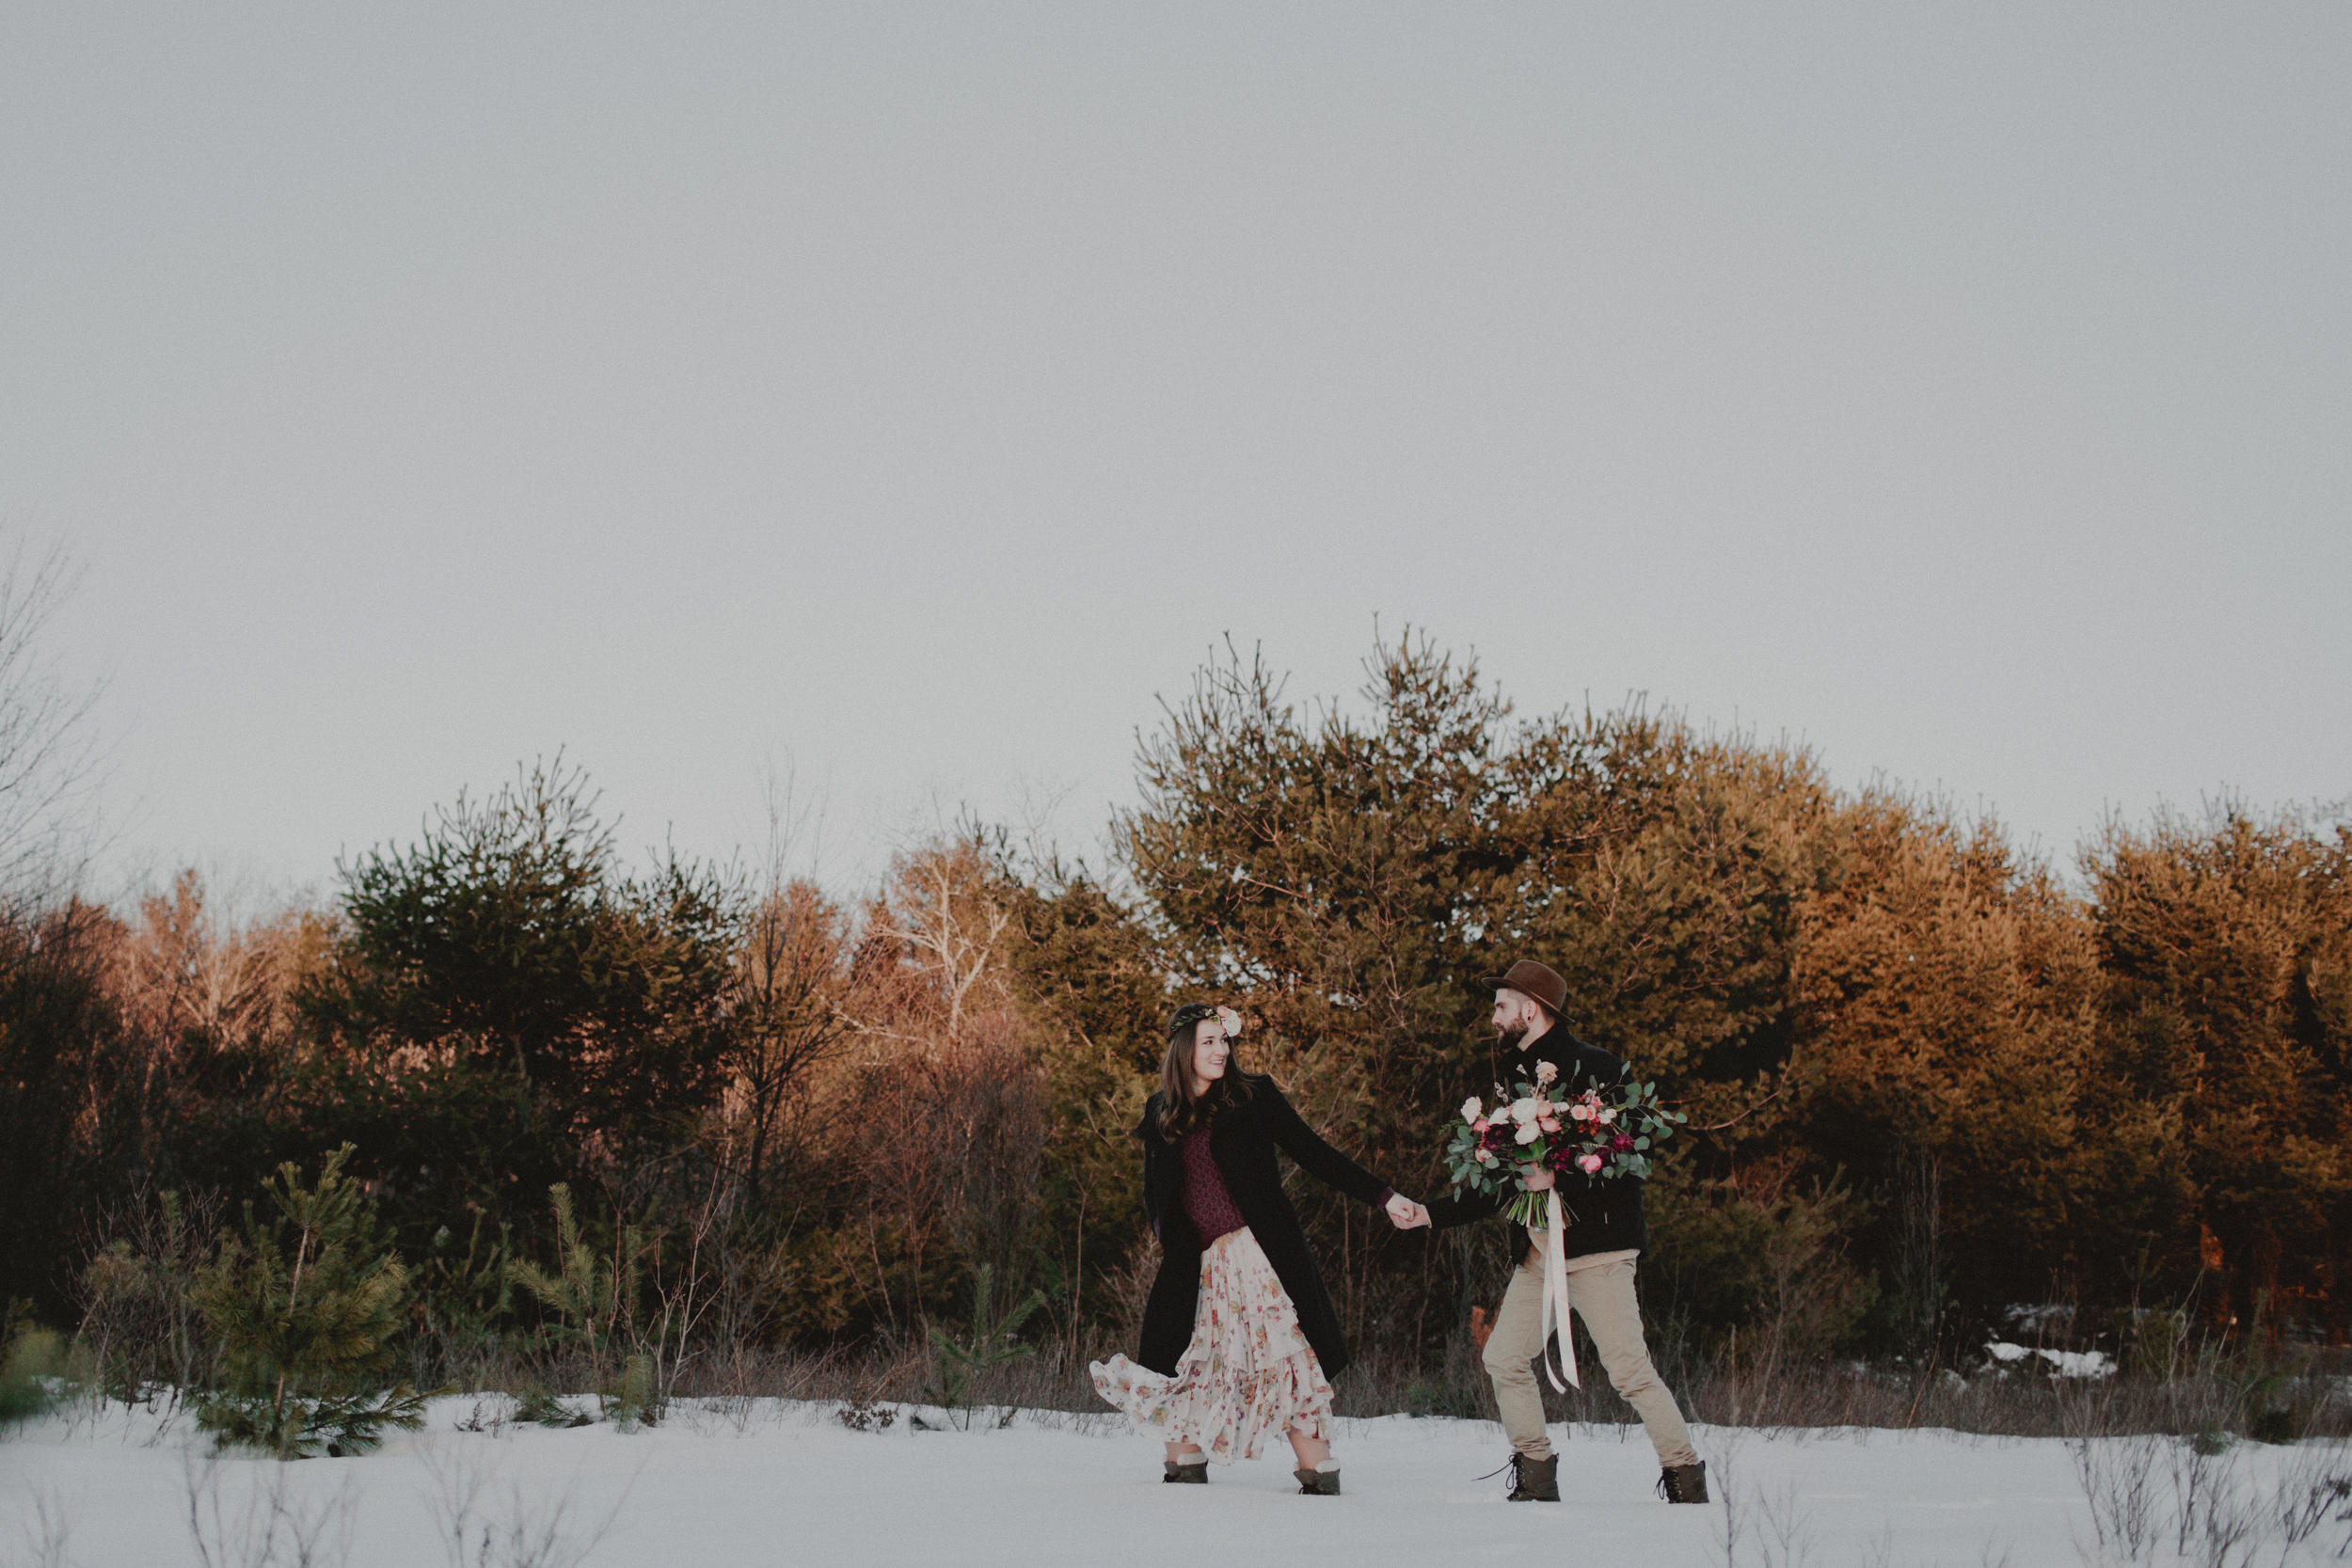 Maine-elopement-photos-127.jpg